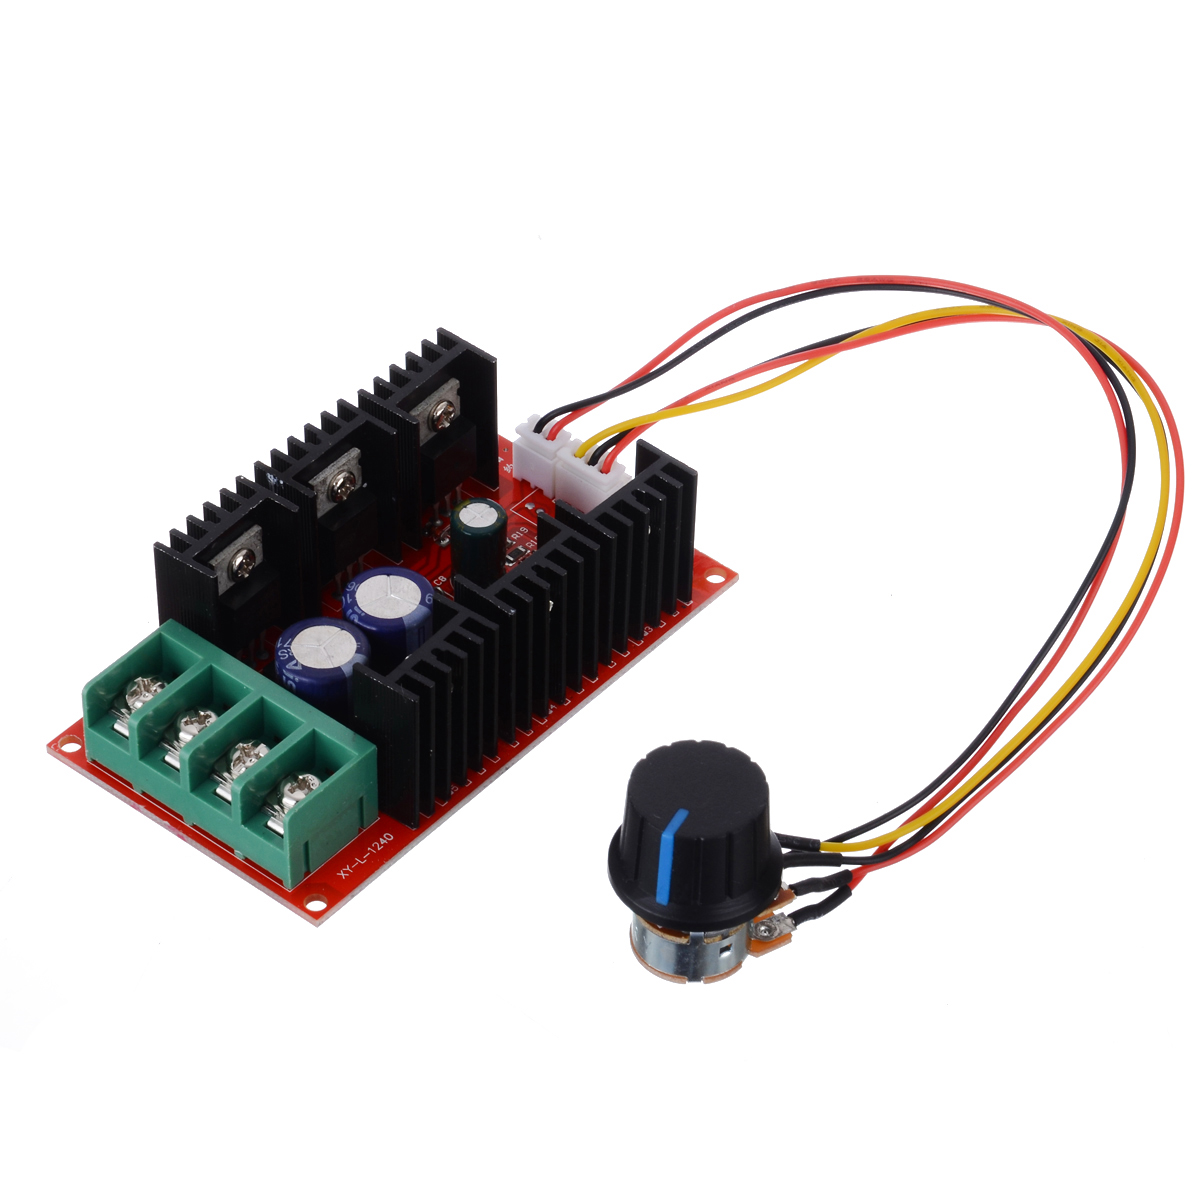 DC 12V 24V 48V Motor Speed Control -50V 2000W 40A Motor Speed Control Module PWM HHO RC Controller